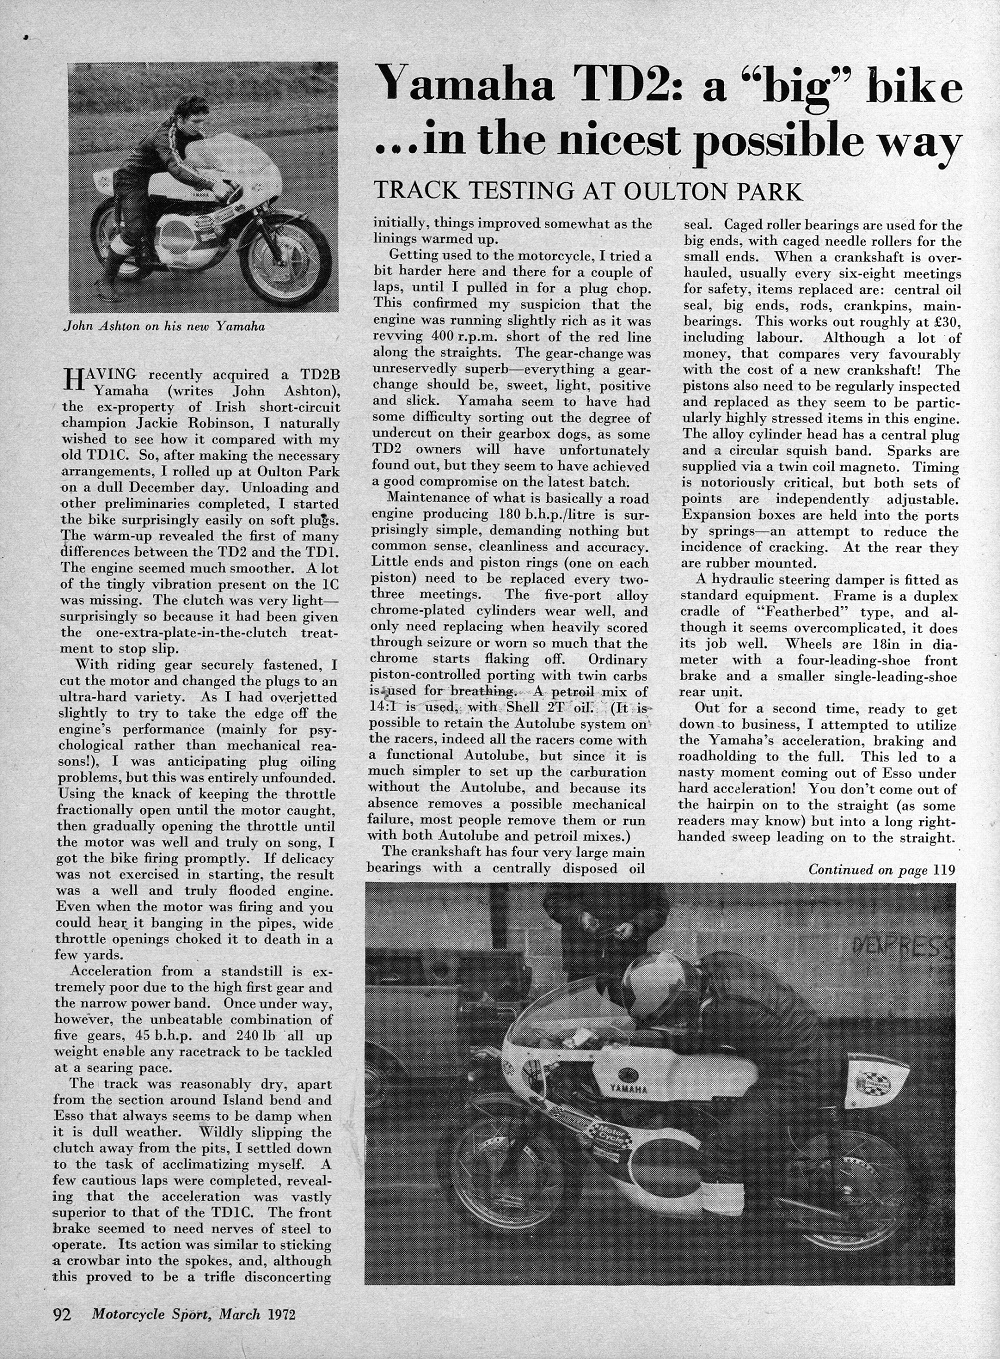 1972 Yamaha TD2B track test.1.jpg